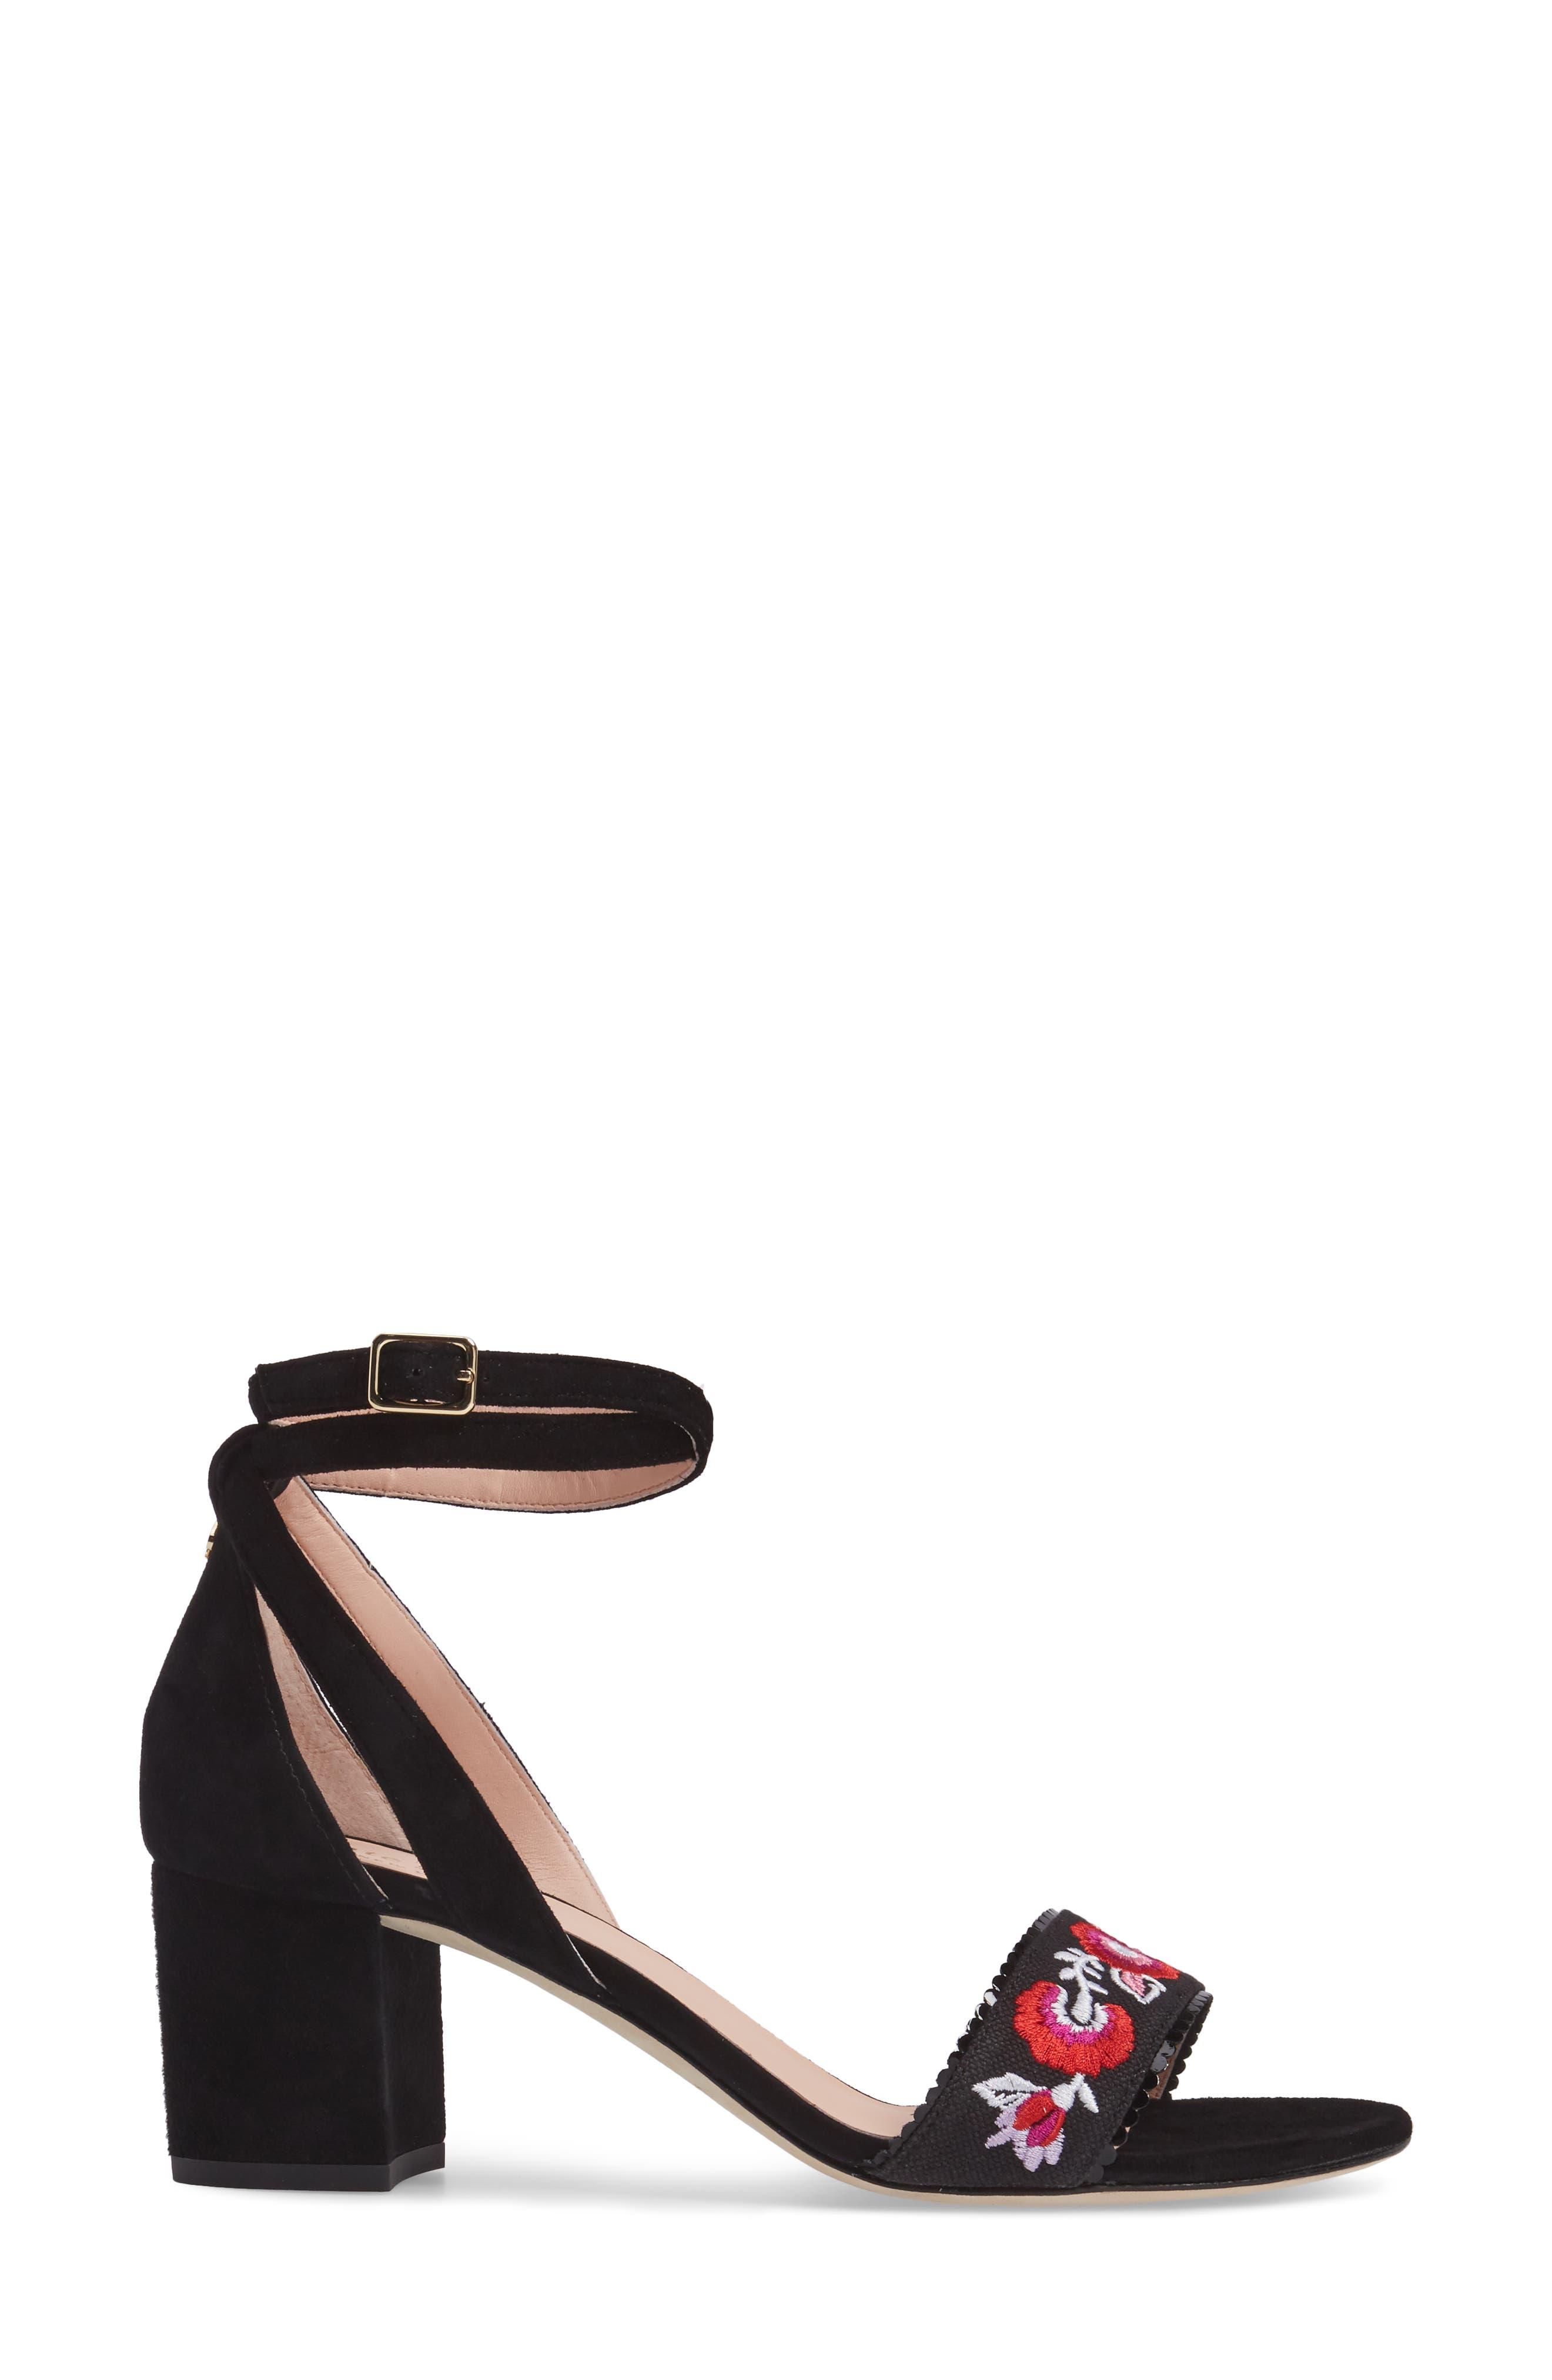 watson genuine calf hair block heel sandal,                             Alternate thumbnail 3, color,                             001